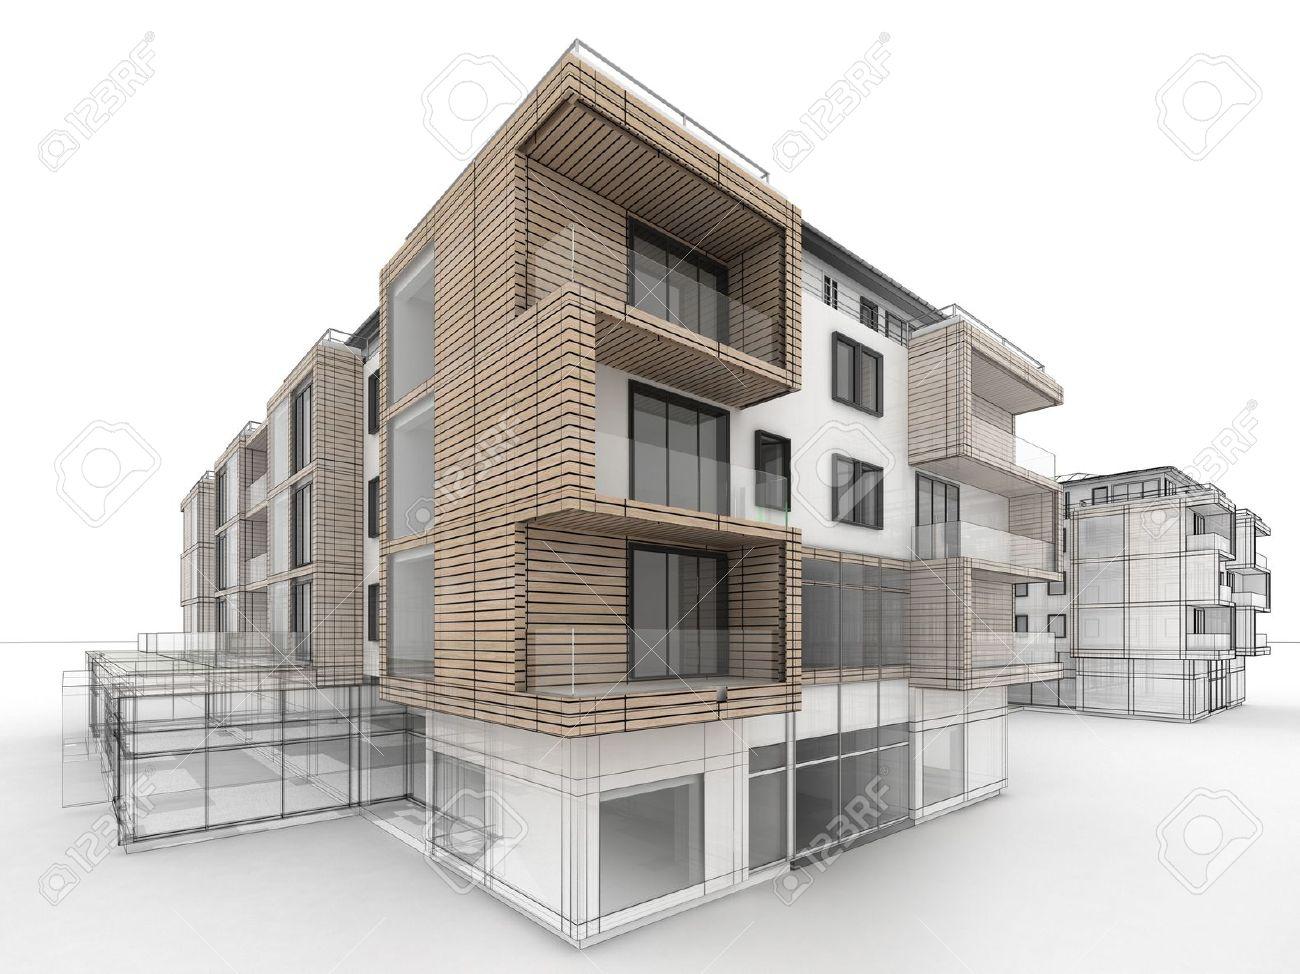 1300x974 Apartment Building Design Progress, Architecture Visualization